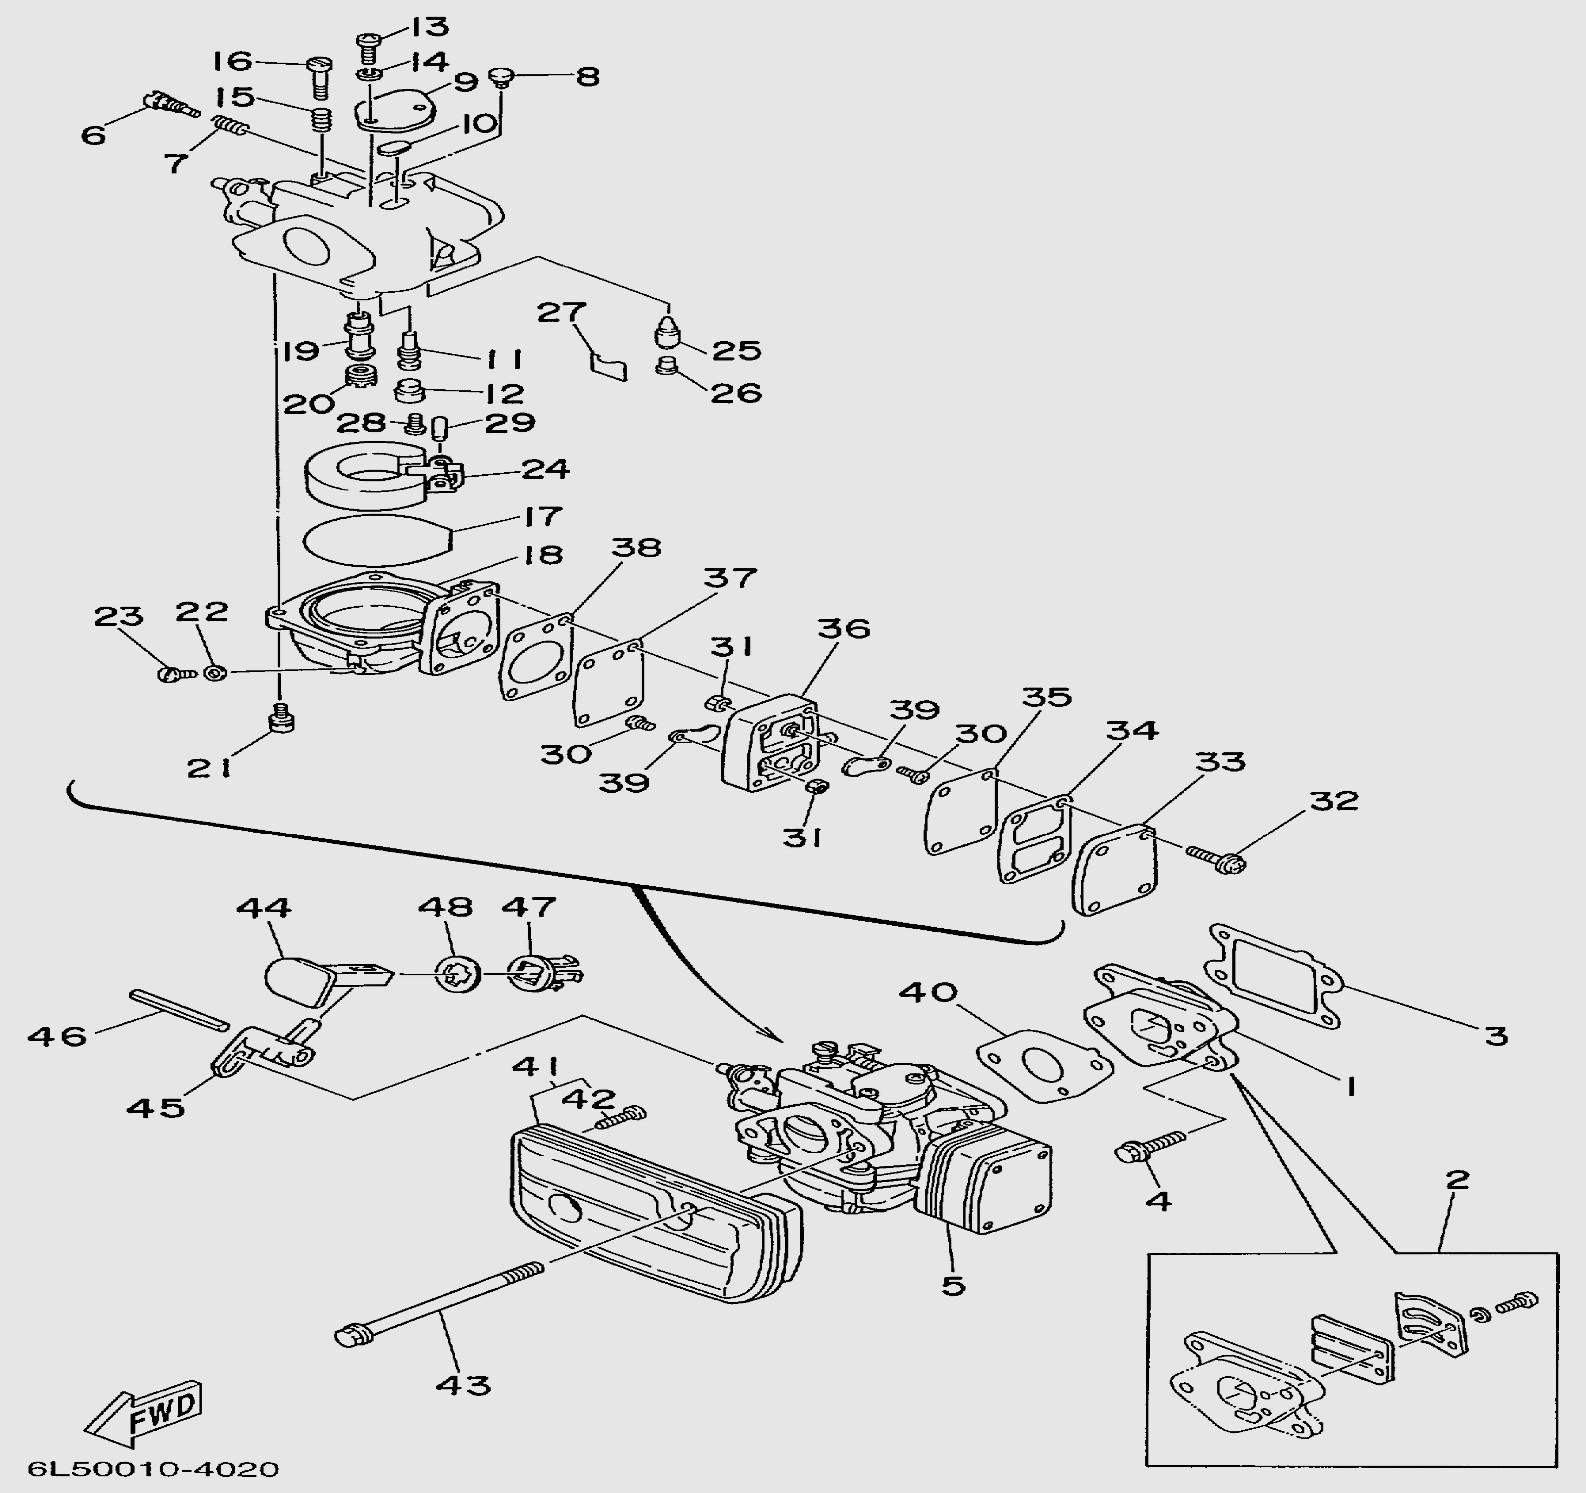 Детали карбюратора для лодочного мотора T3S SEA-PRO